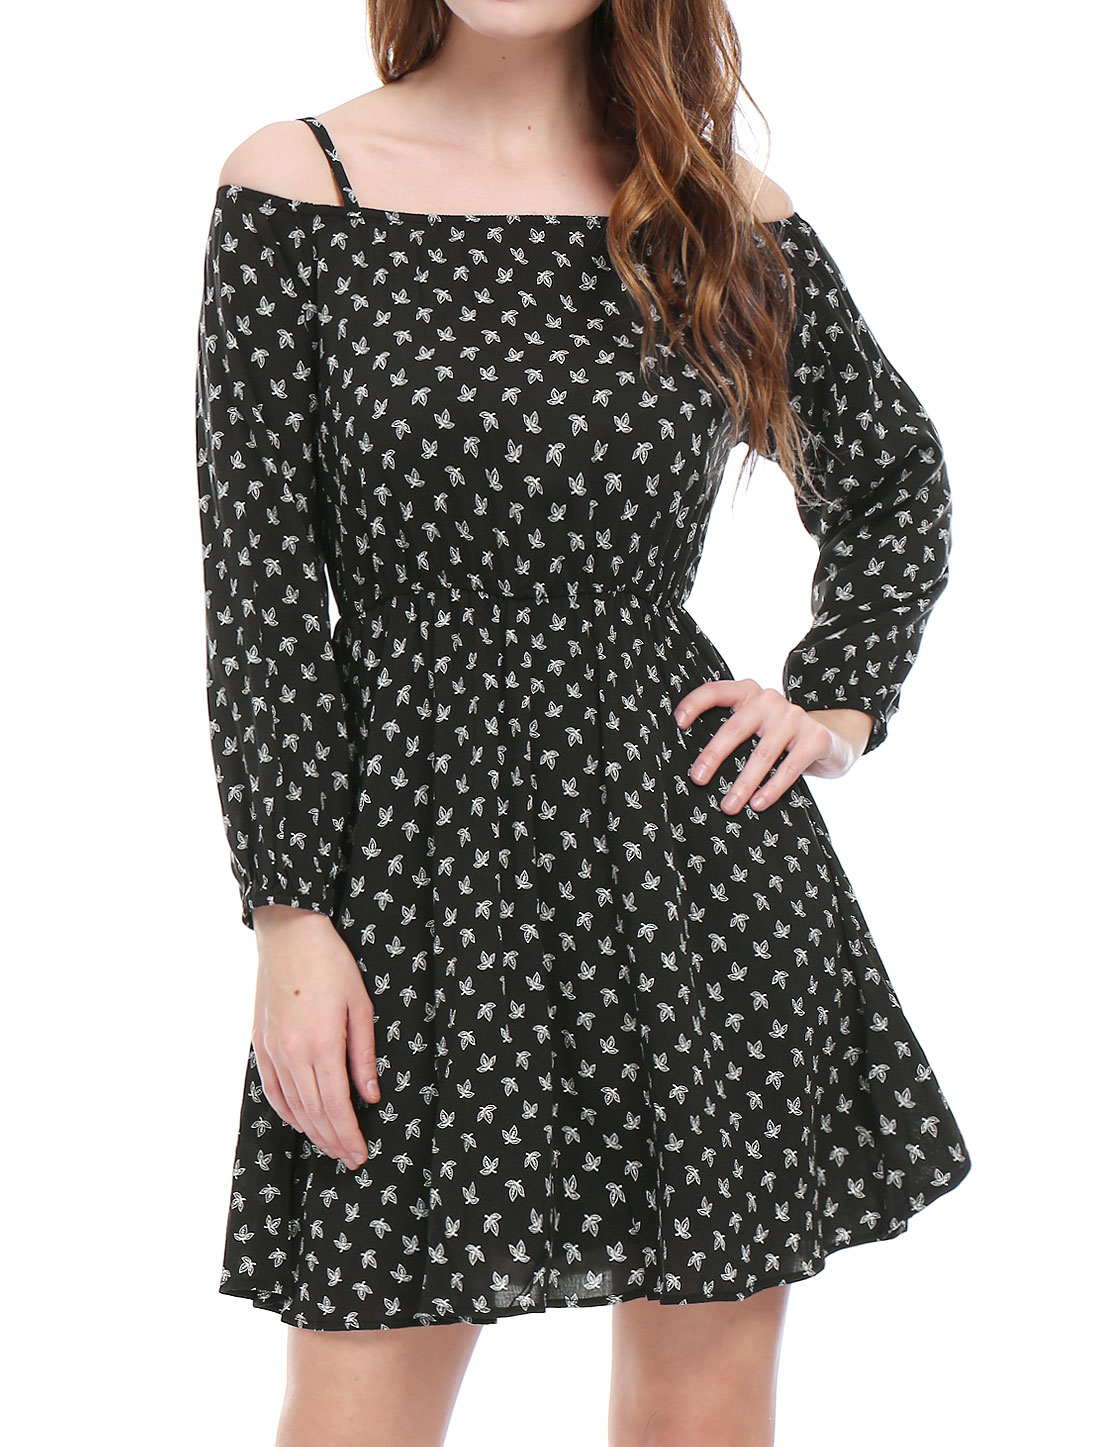 Women Cold Shoulder Leaves Prints Long Sleeves Bardot Dress Black XS